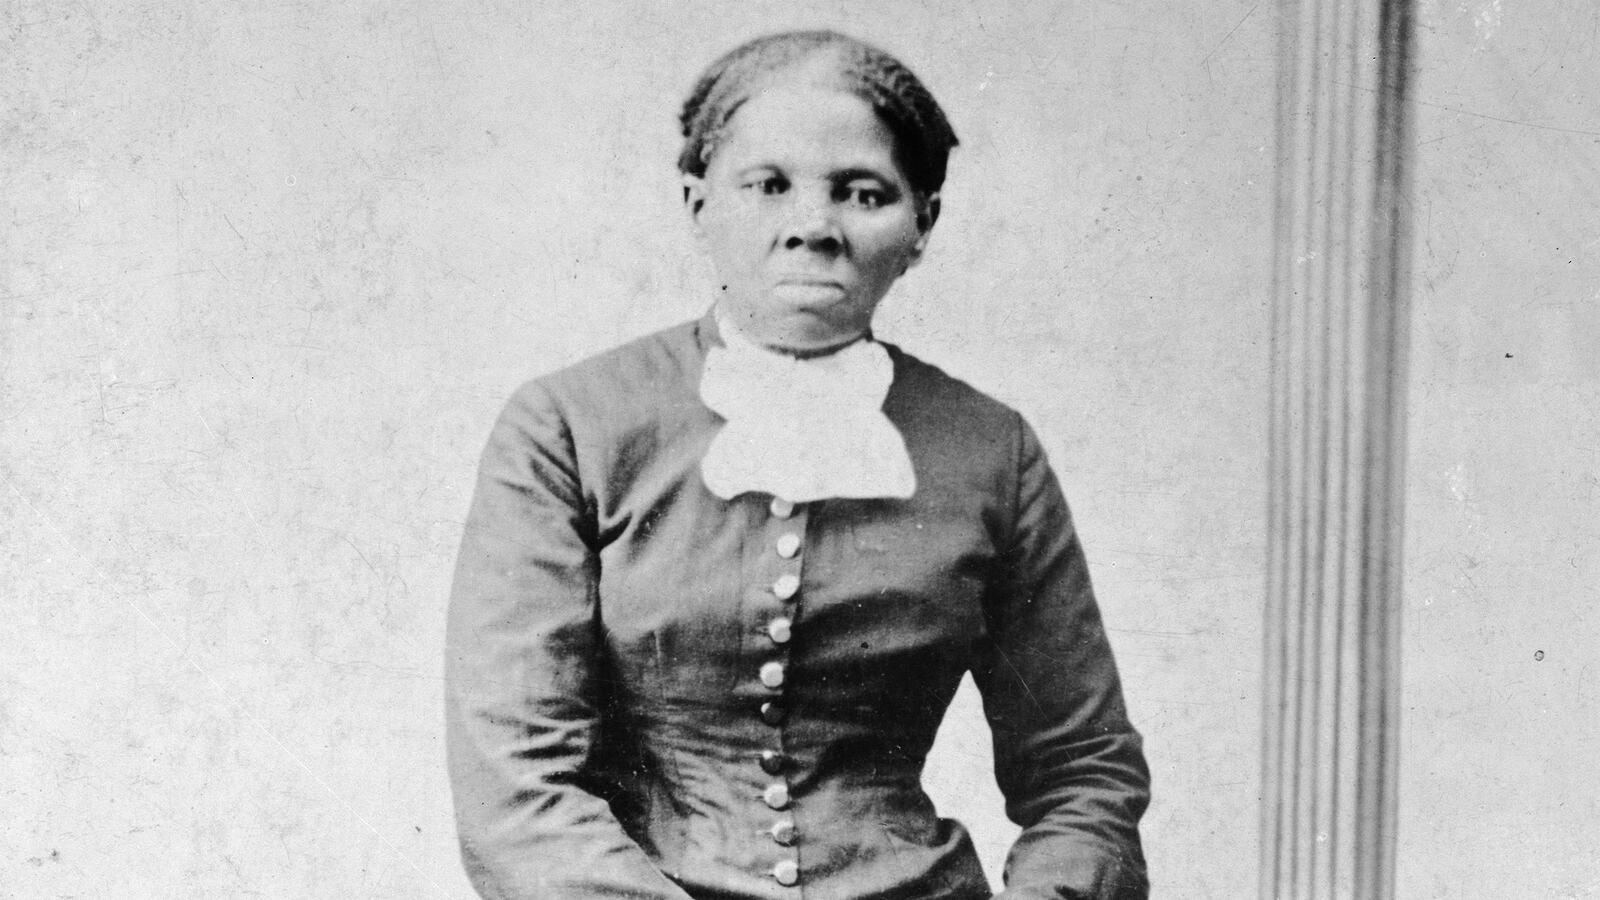 Harriet Tubman, abolitionist and political activist